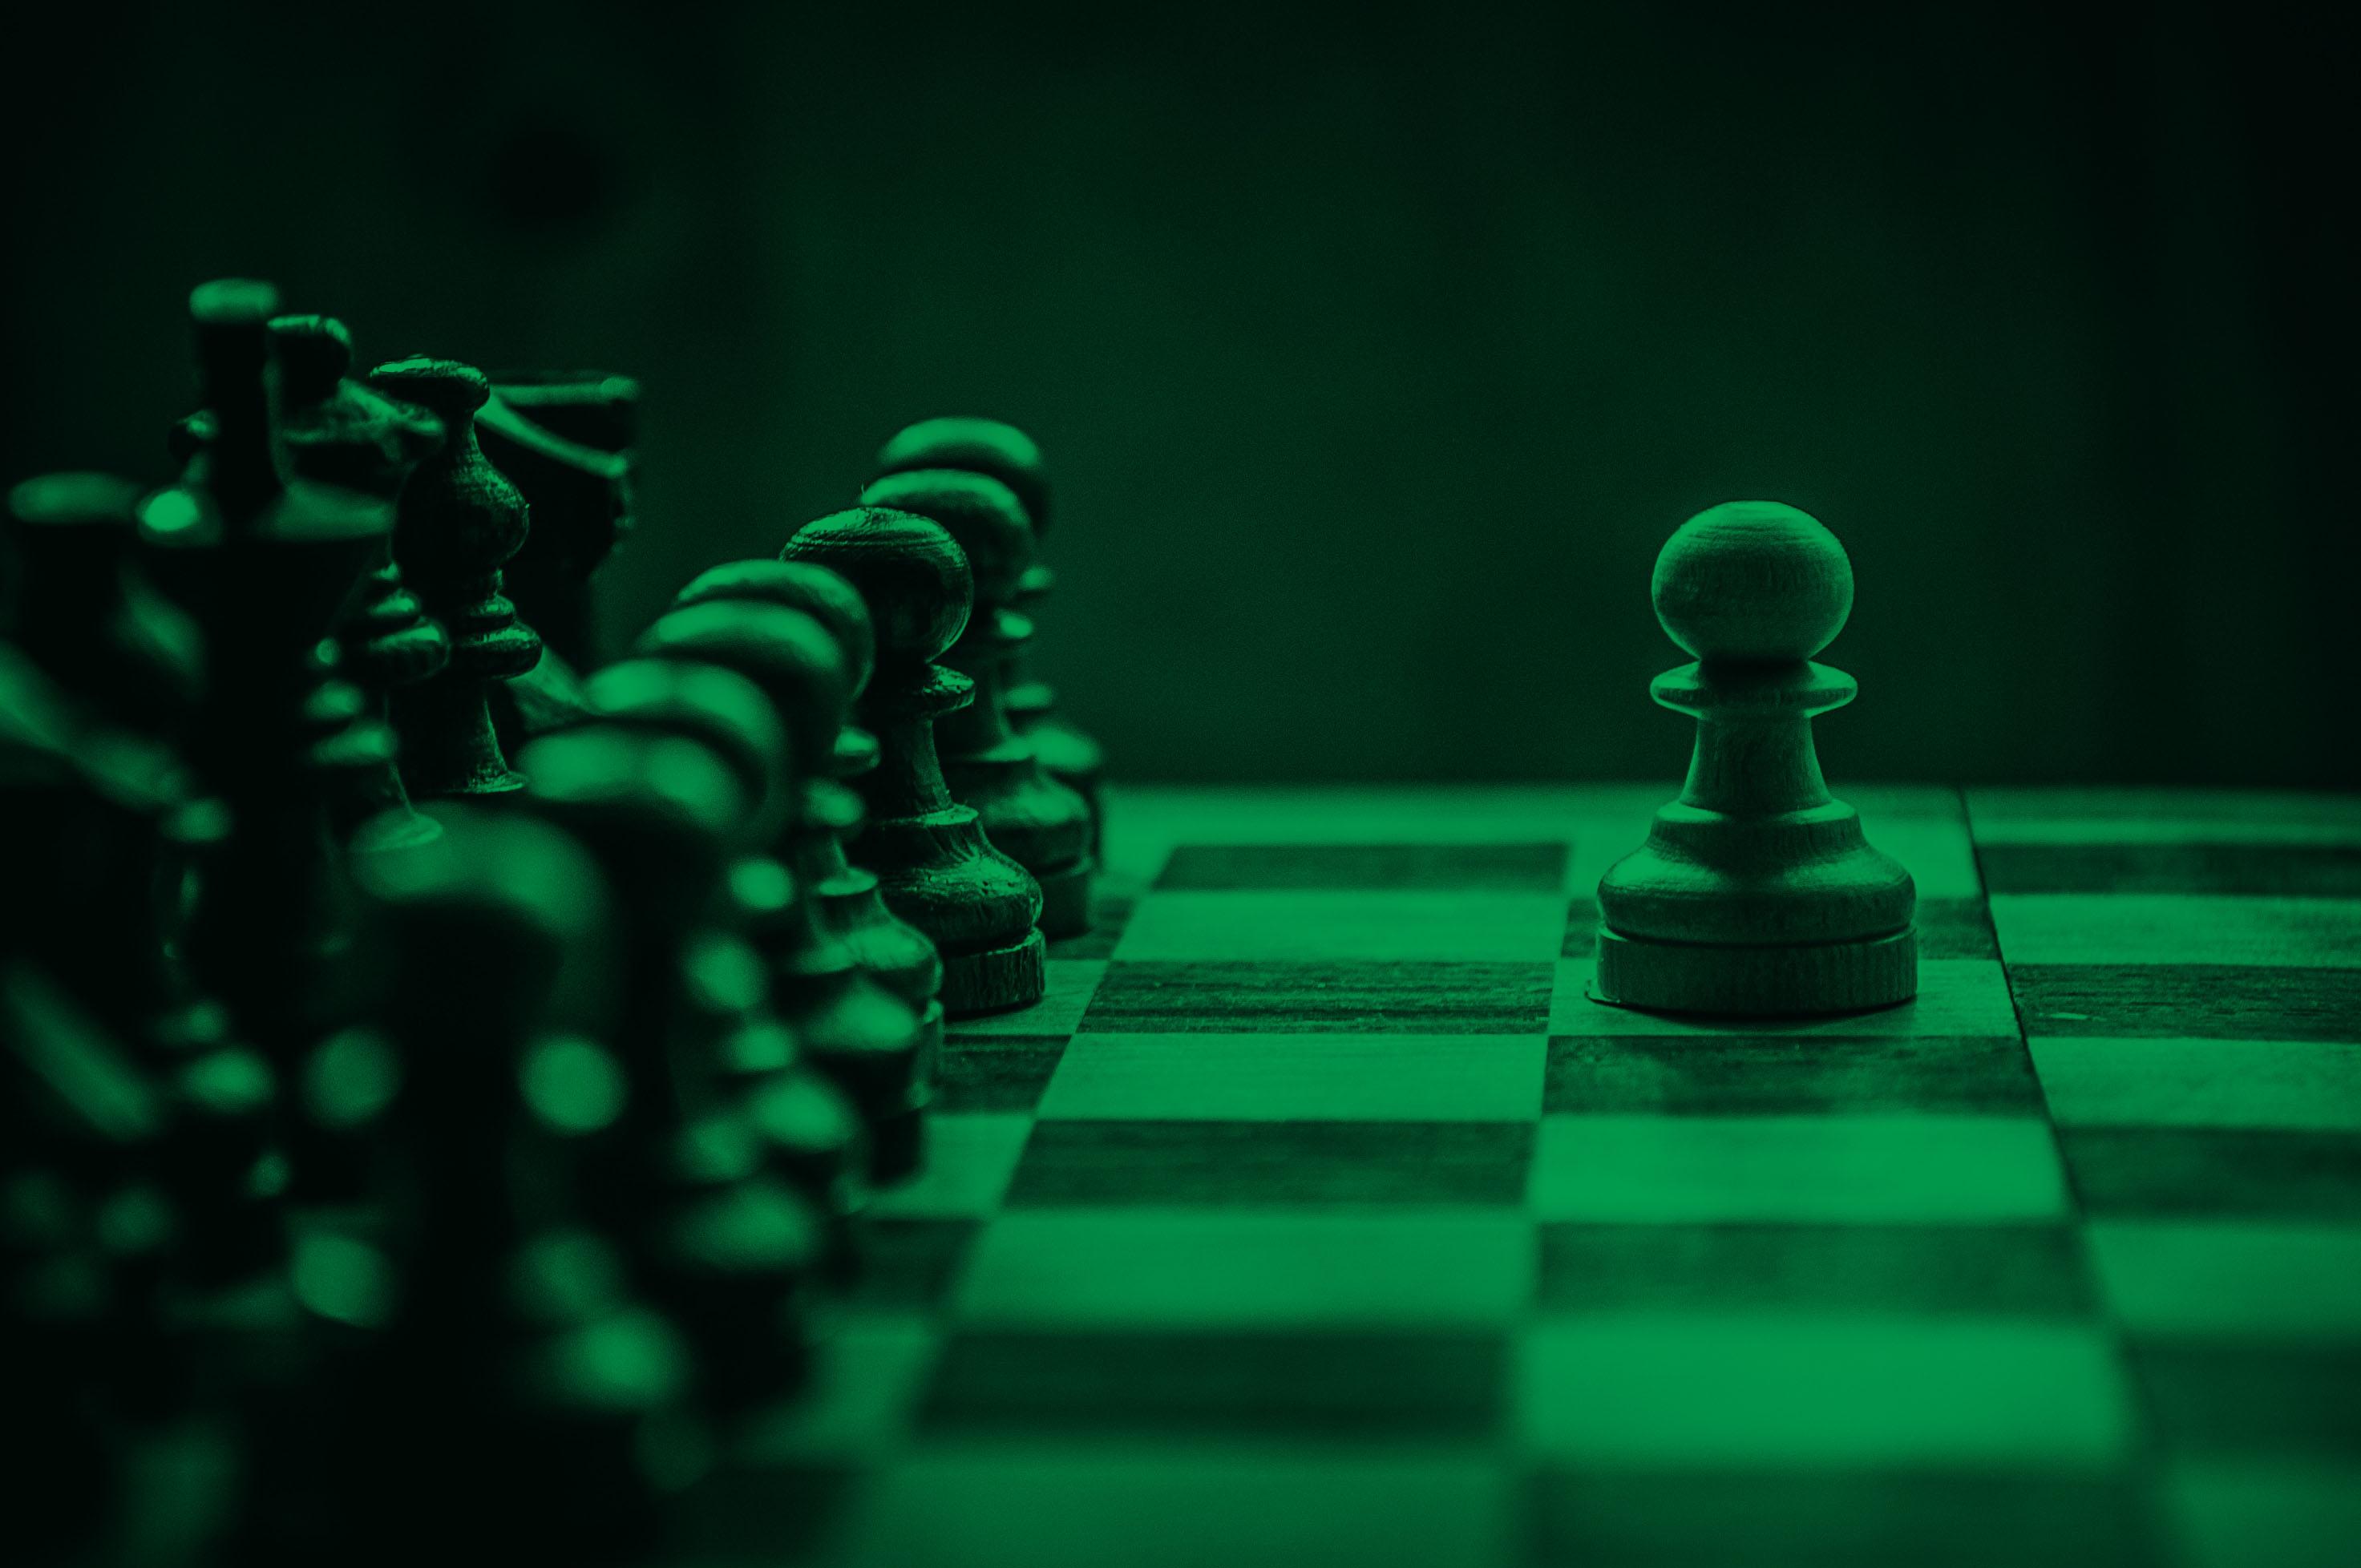 Chess_Board_Green.jpg